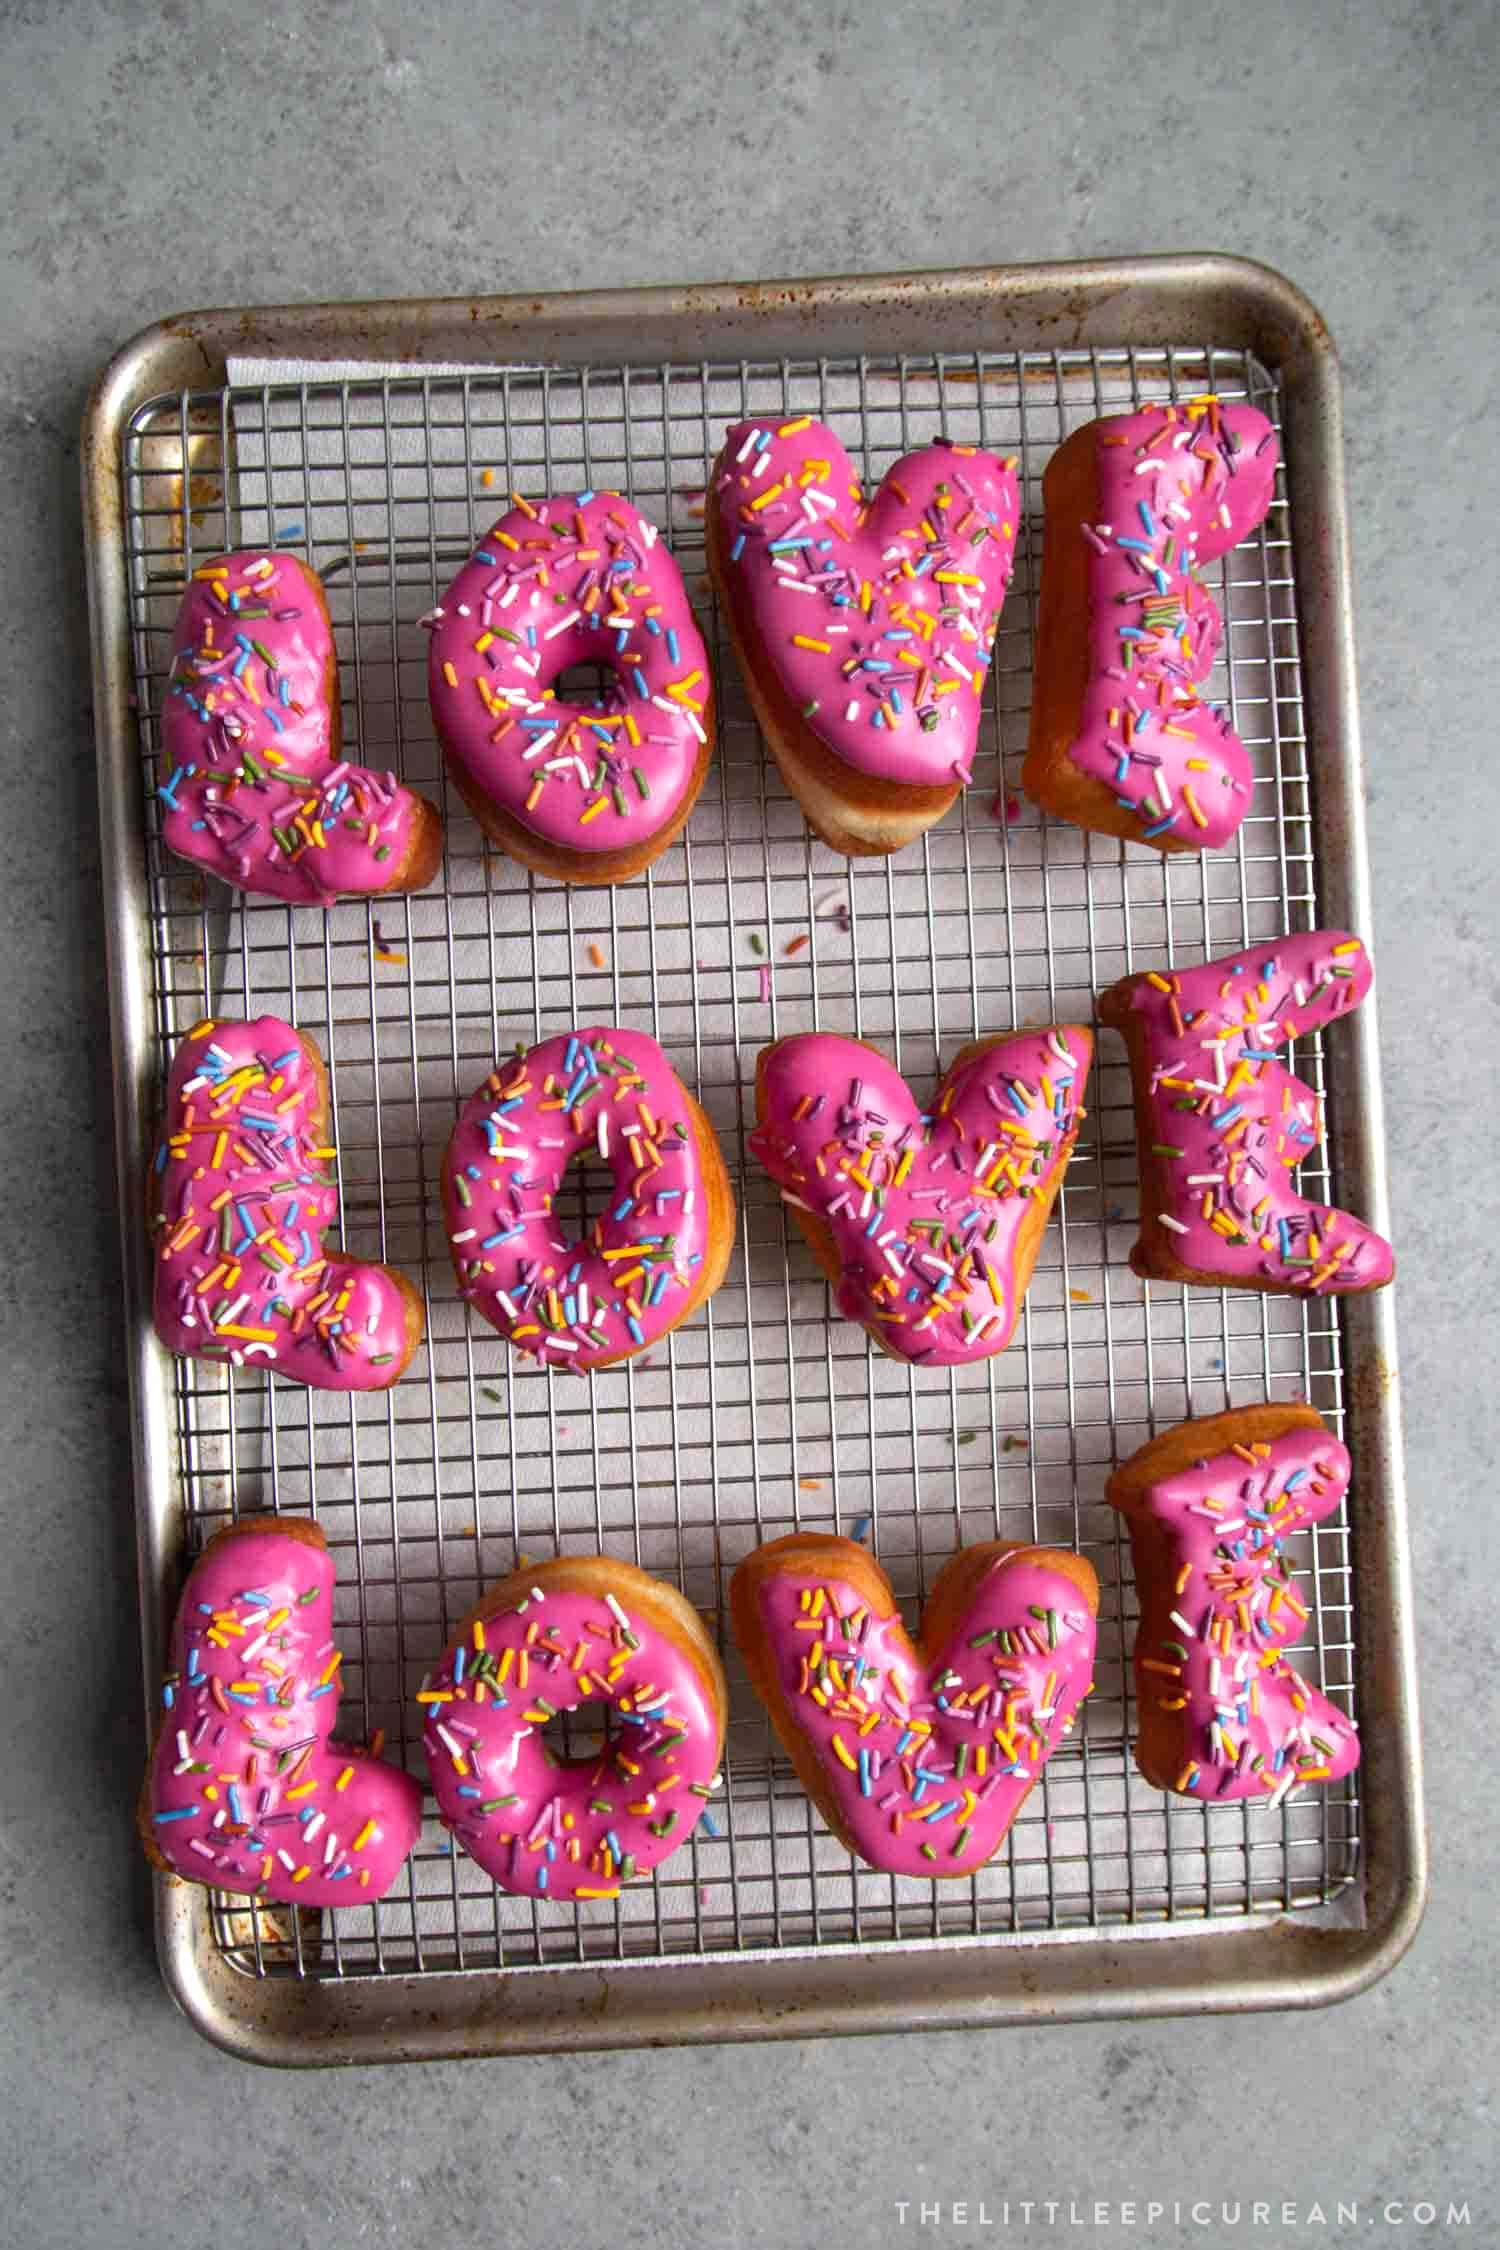 Glazed Letter Donuts With Sprinkles